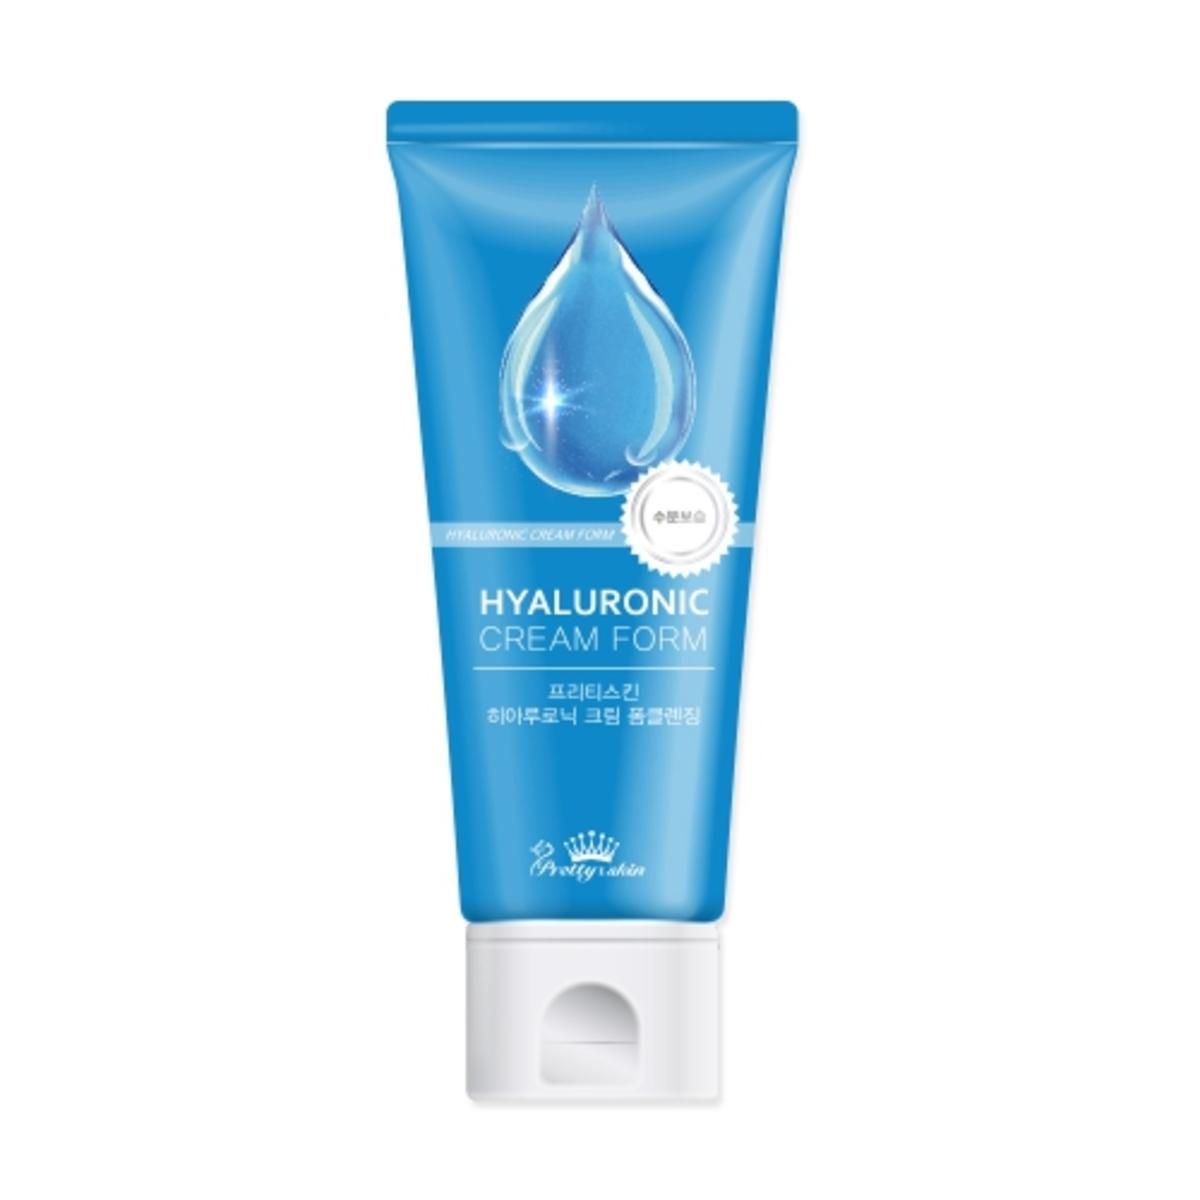 Hyaluronic Cream Form